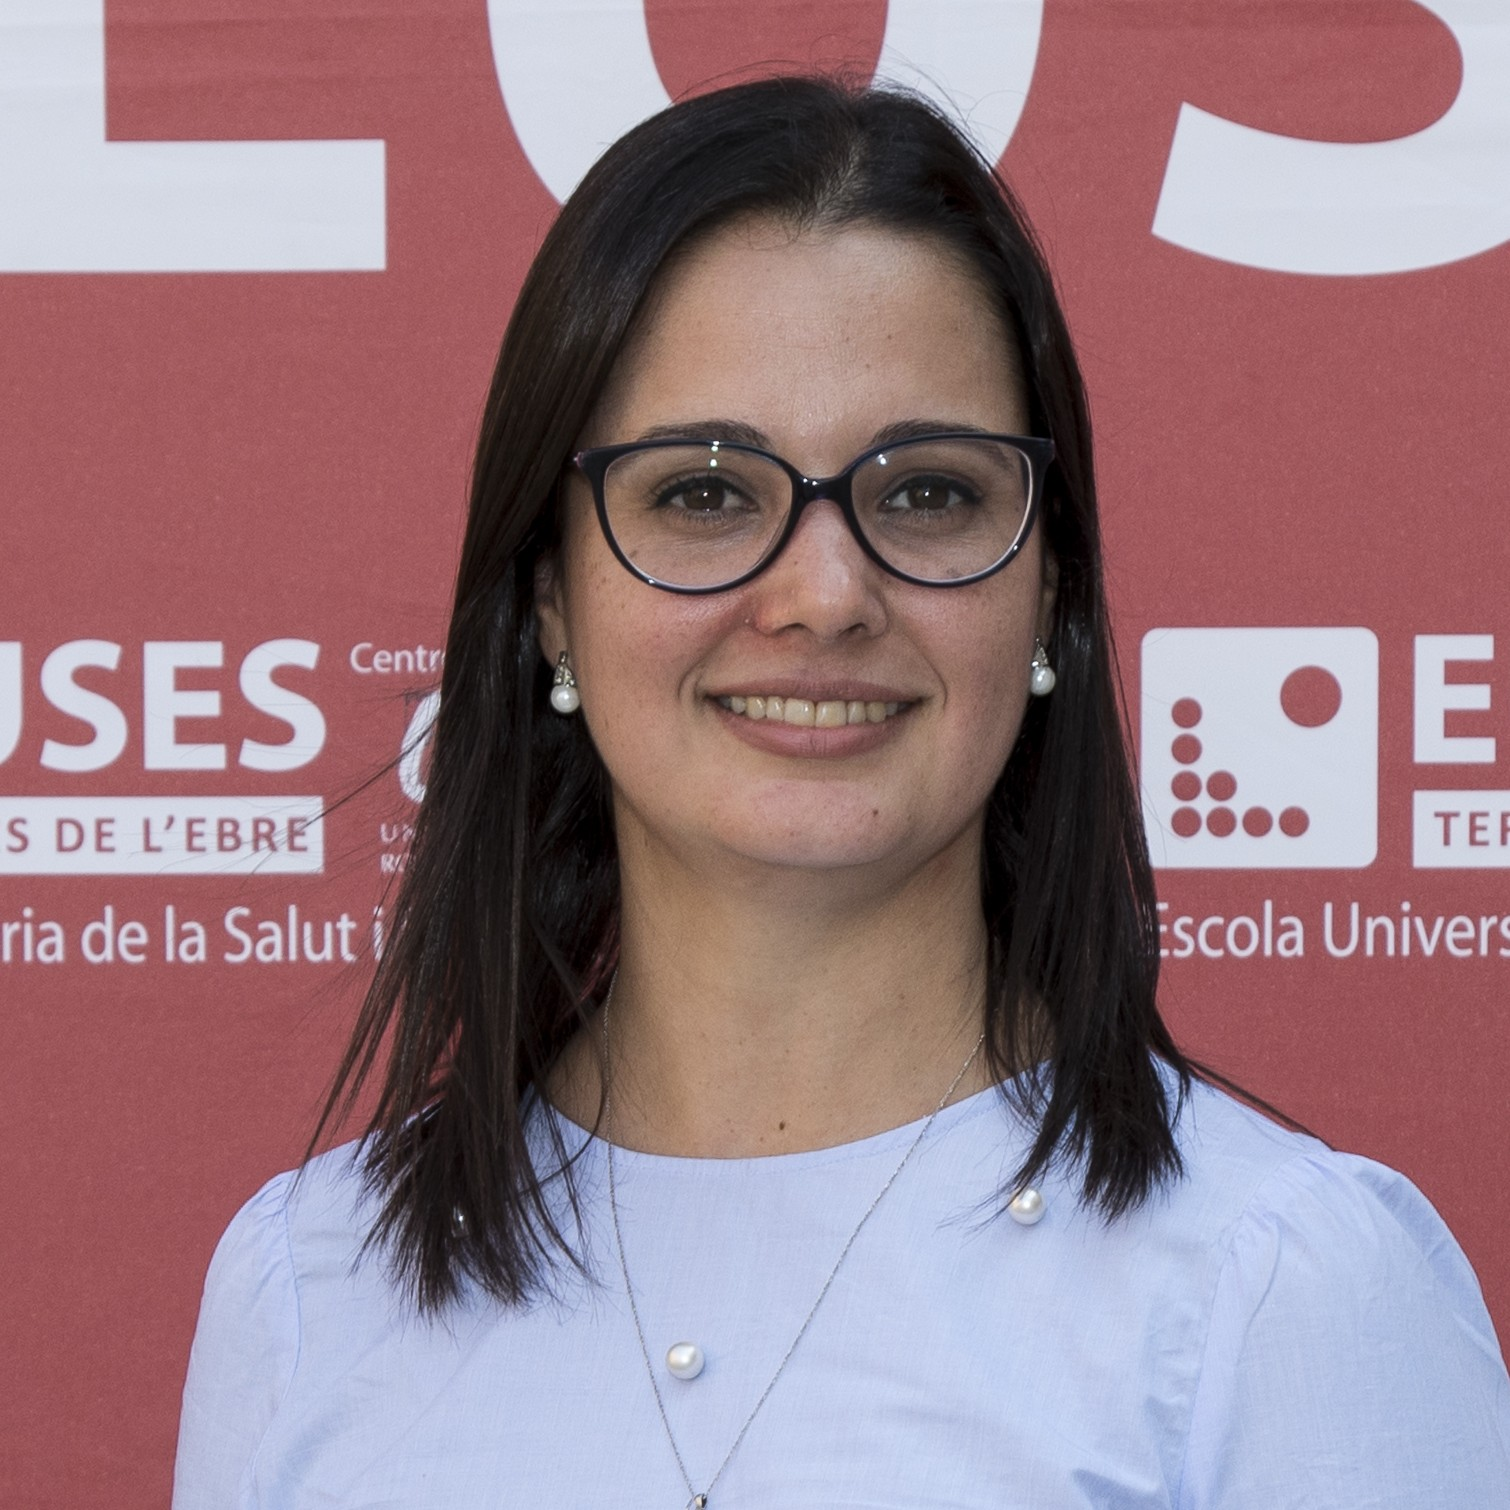 Renata Muñoz Reis